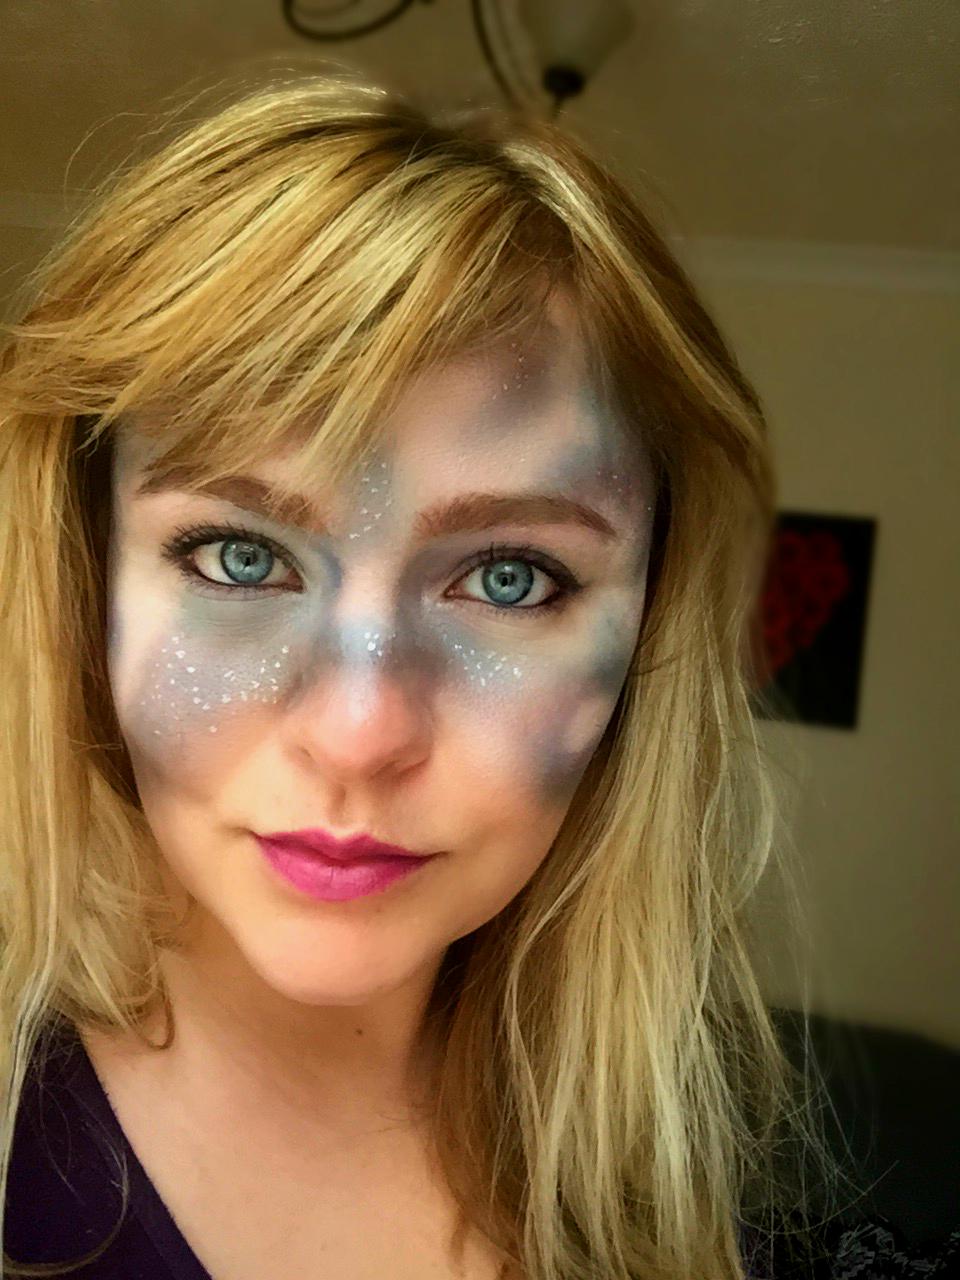 galaxy makeup tutorial simple halloween makeup 1 - Simple Halloween Images